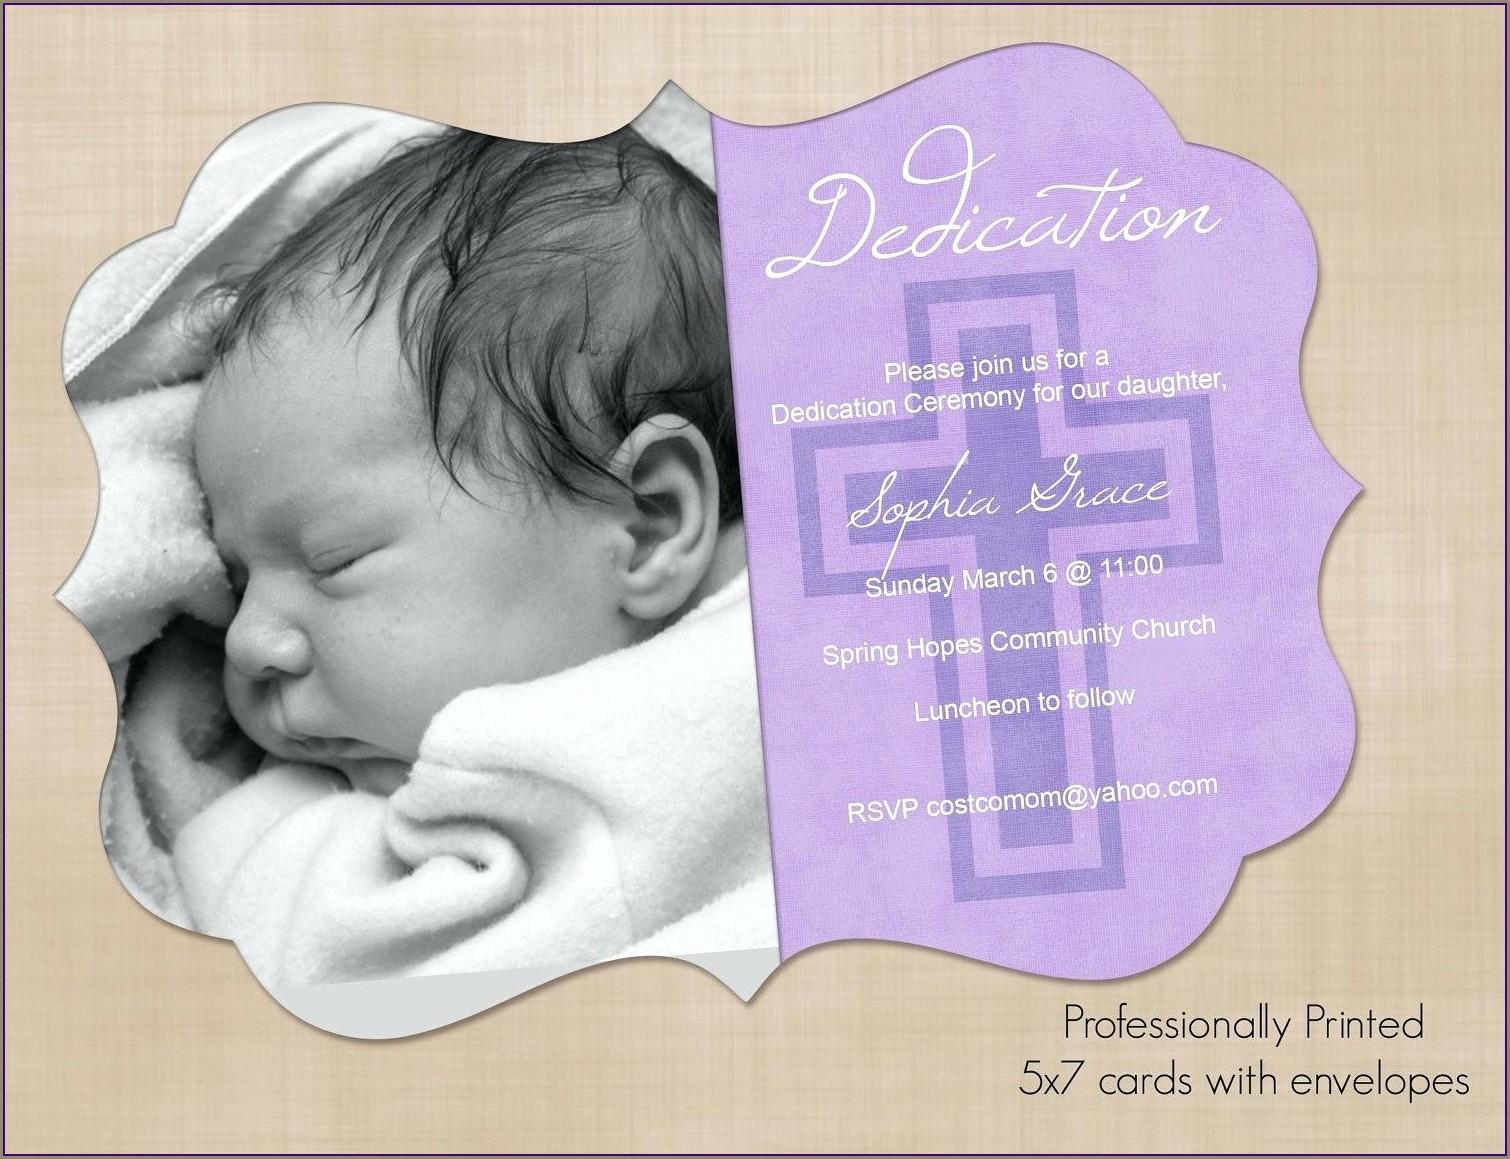 New Church Dedication Invitation Sample Cards